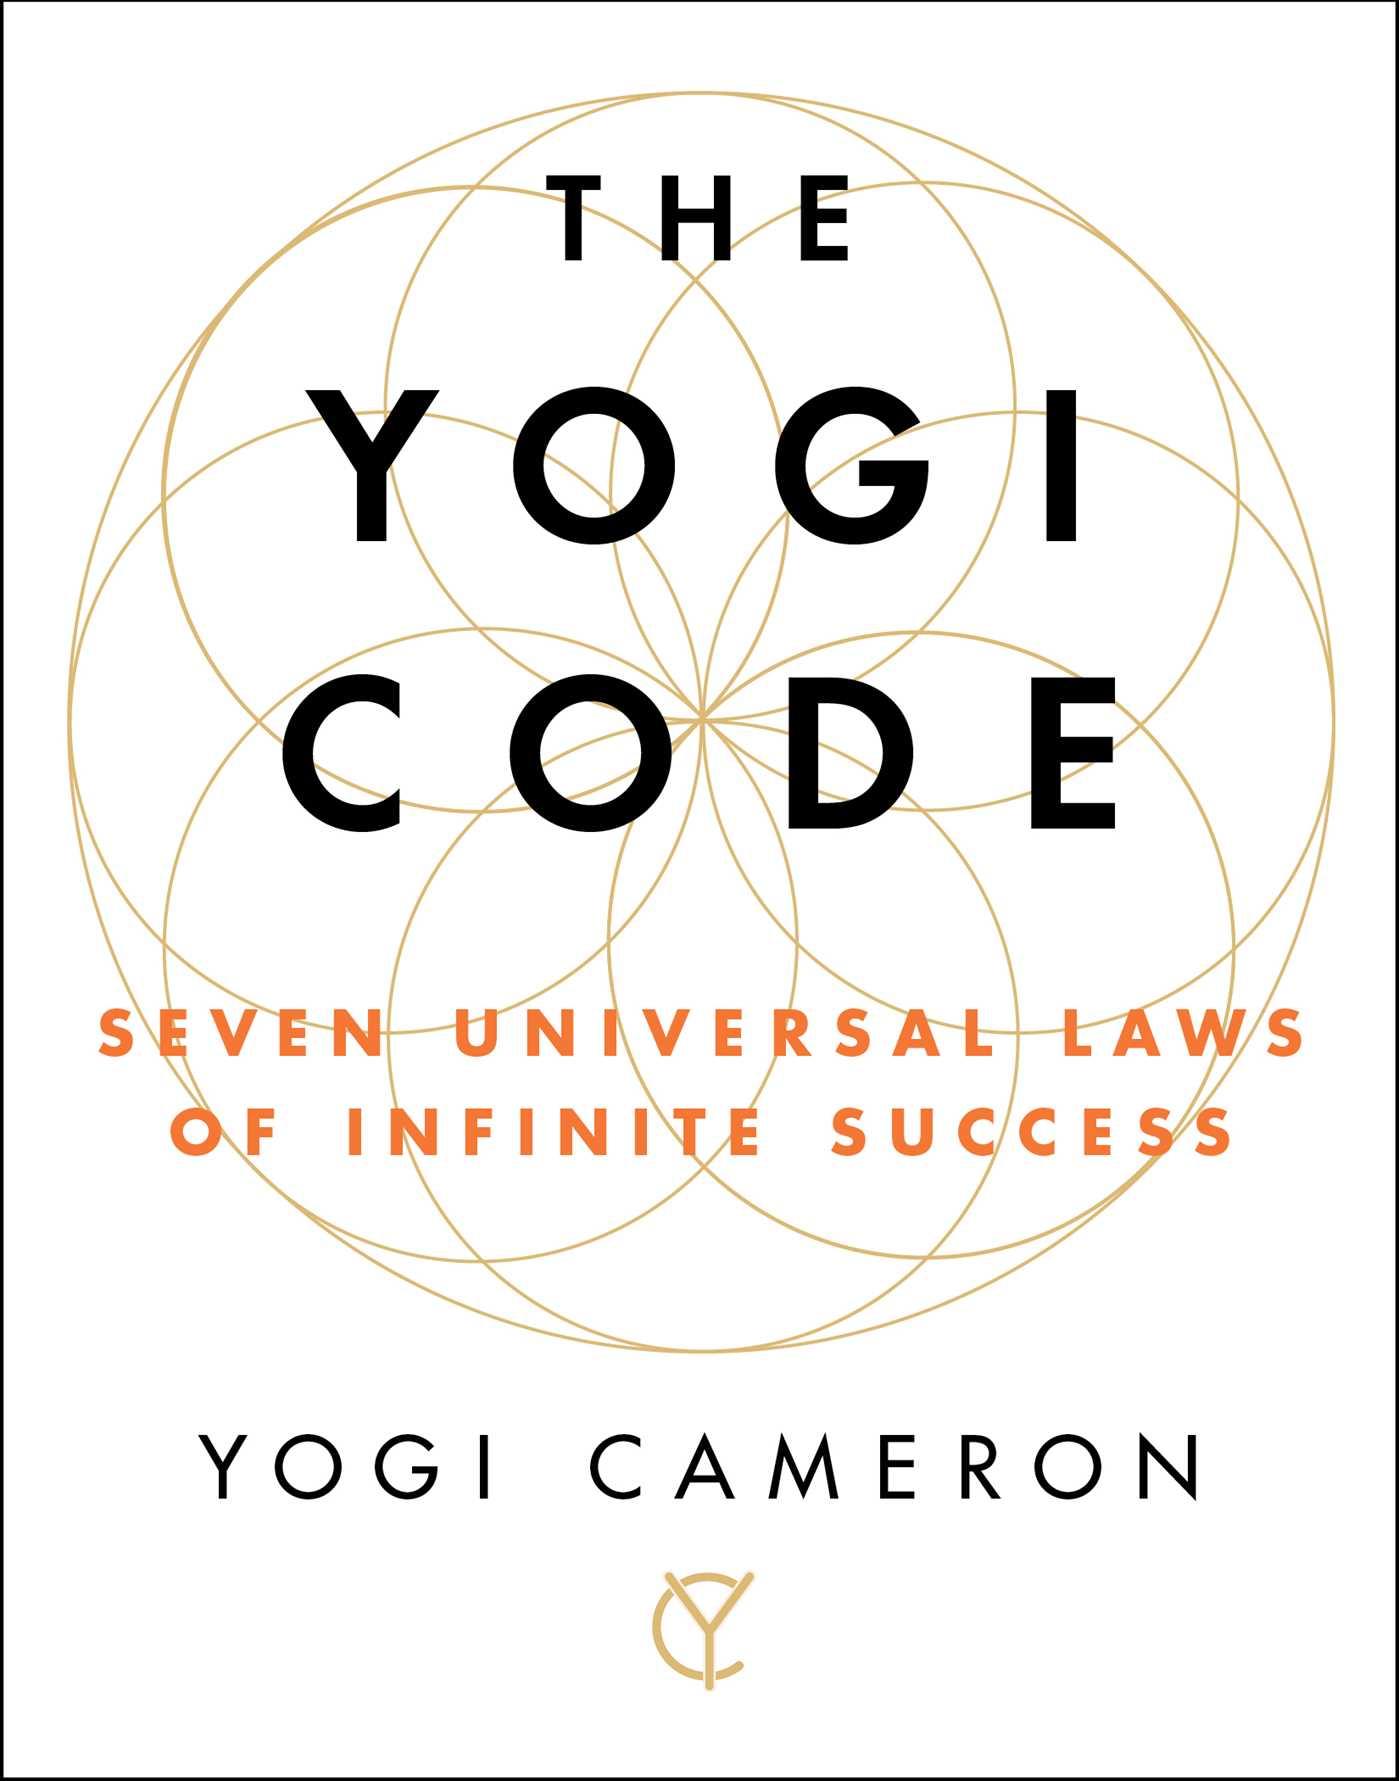 Book Cover Image (jpg): The Yogi Code